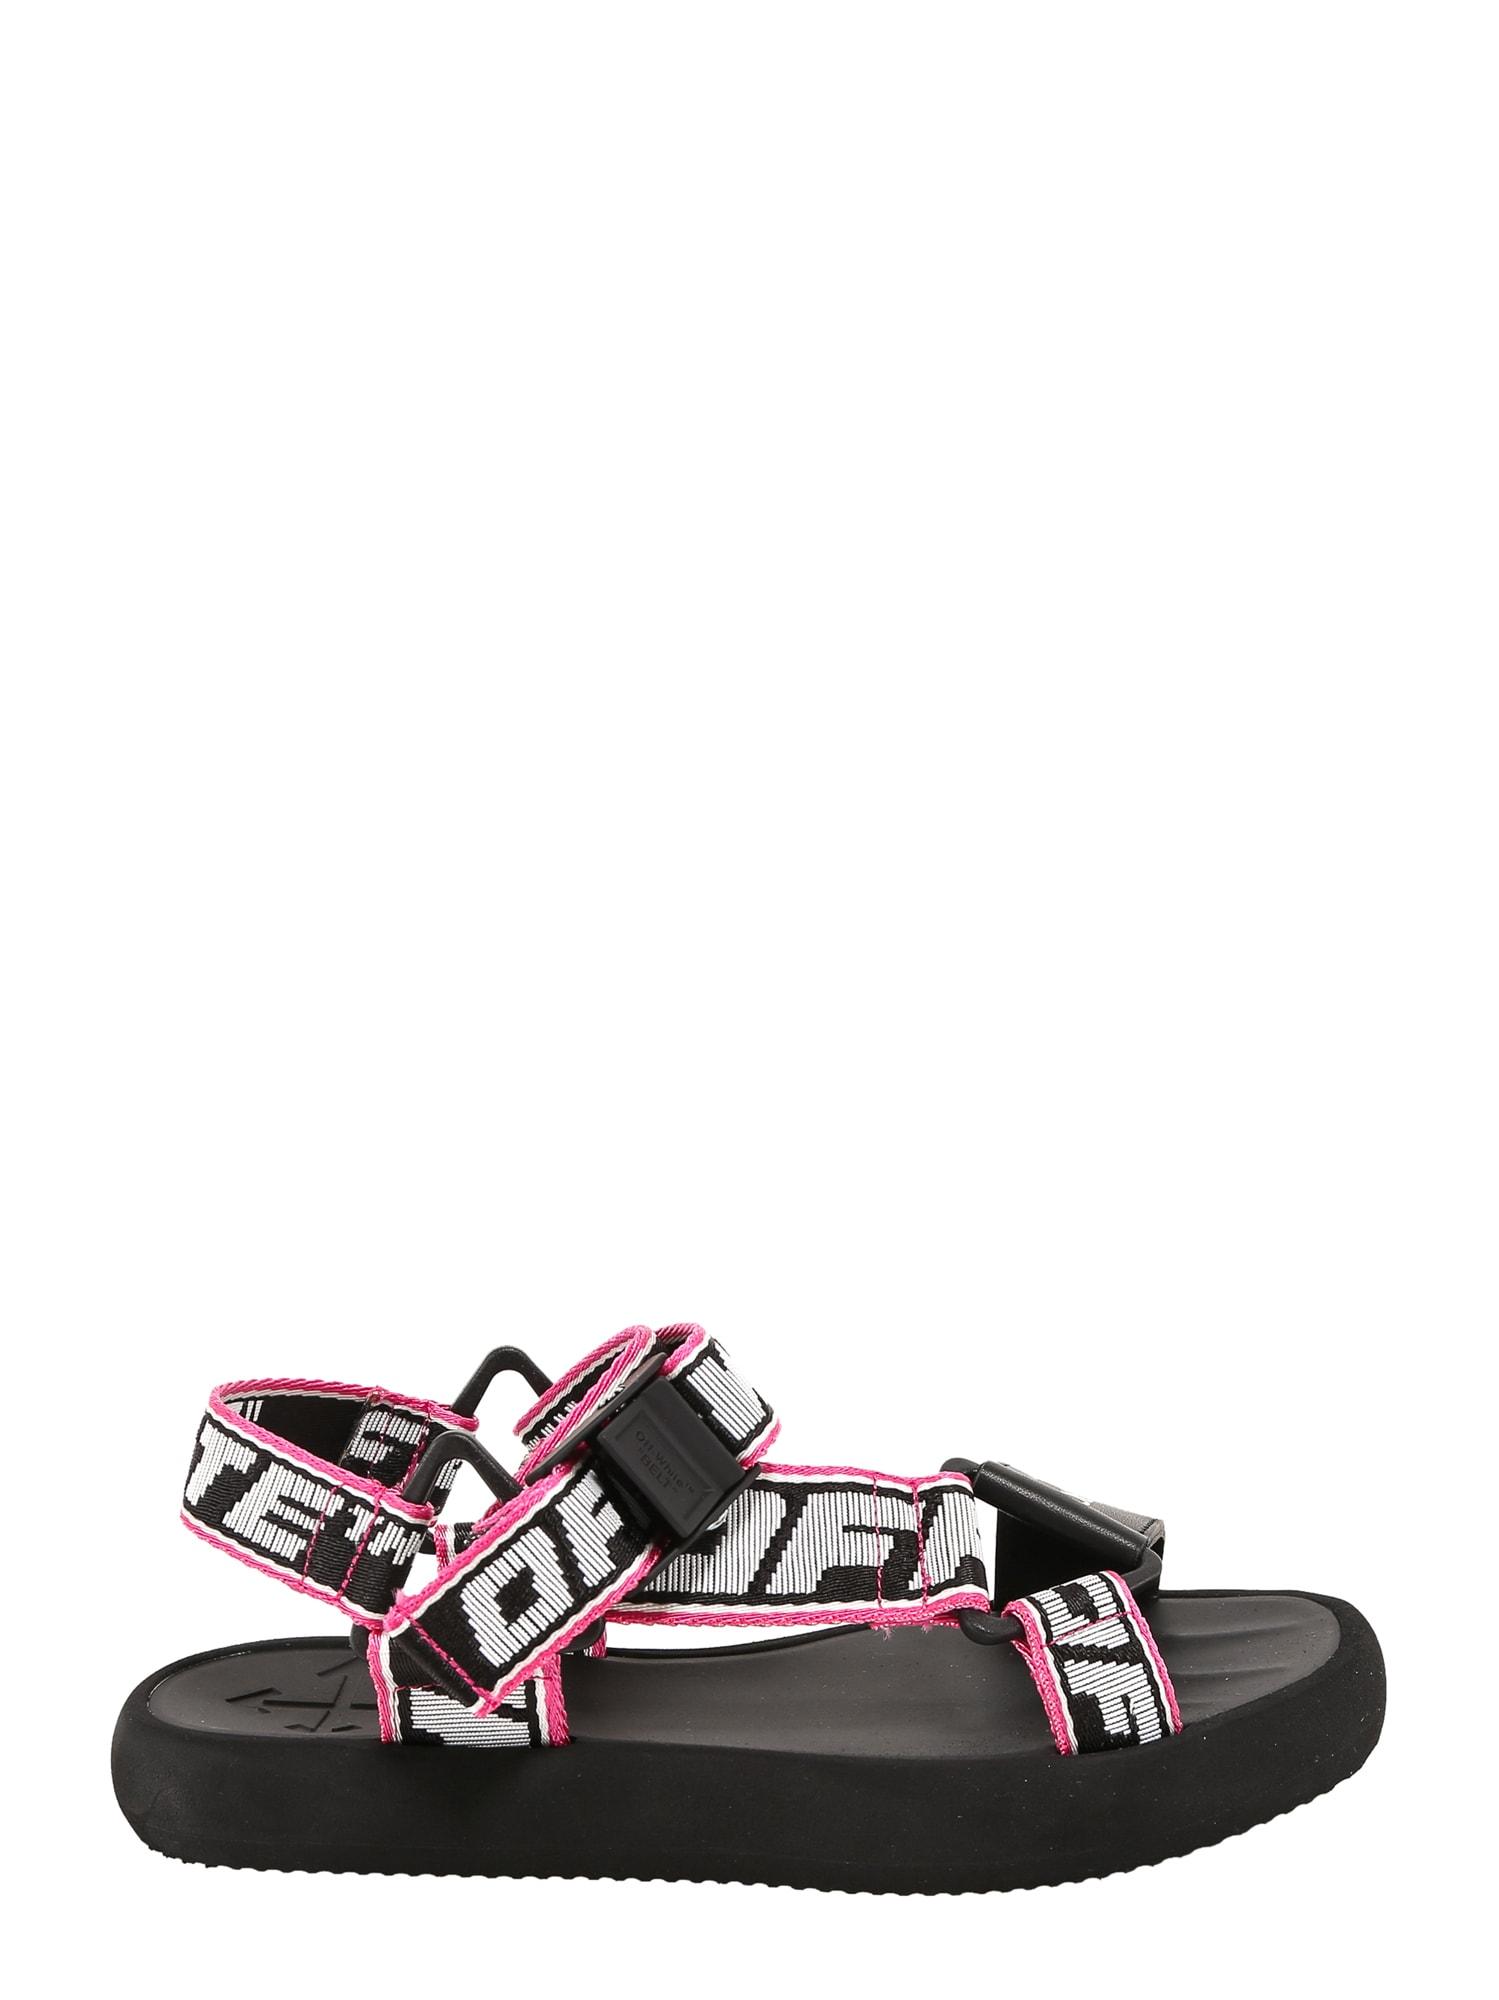 Off-White Sandals SANDALS